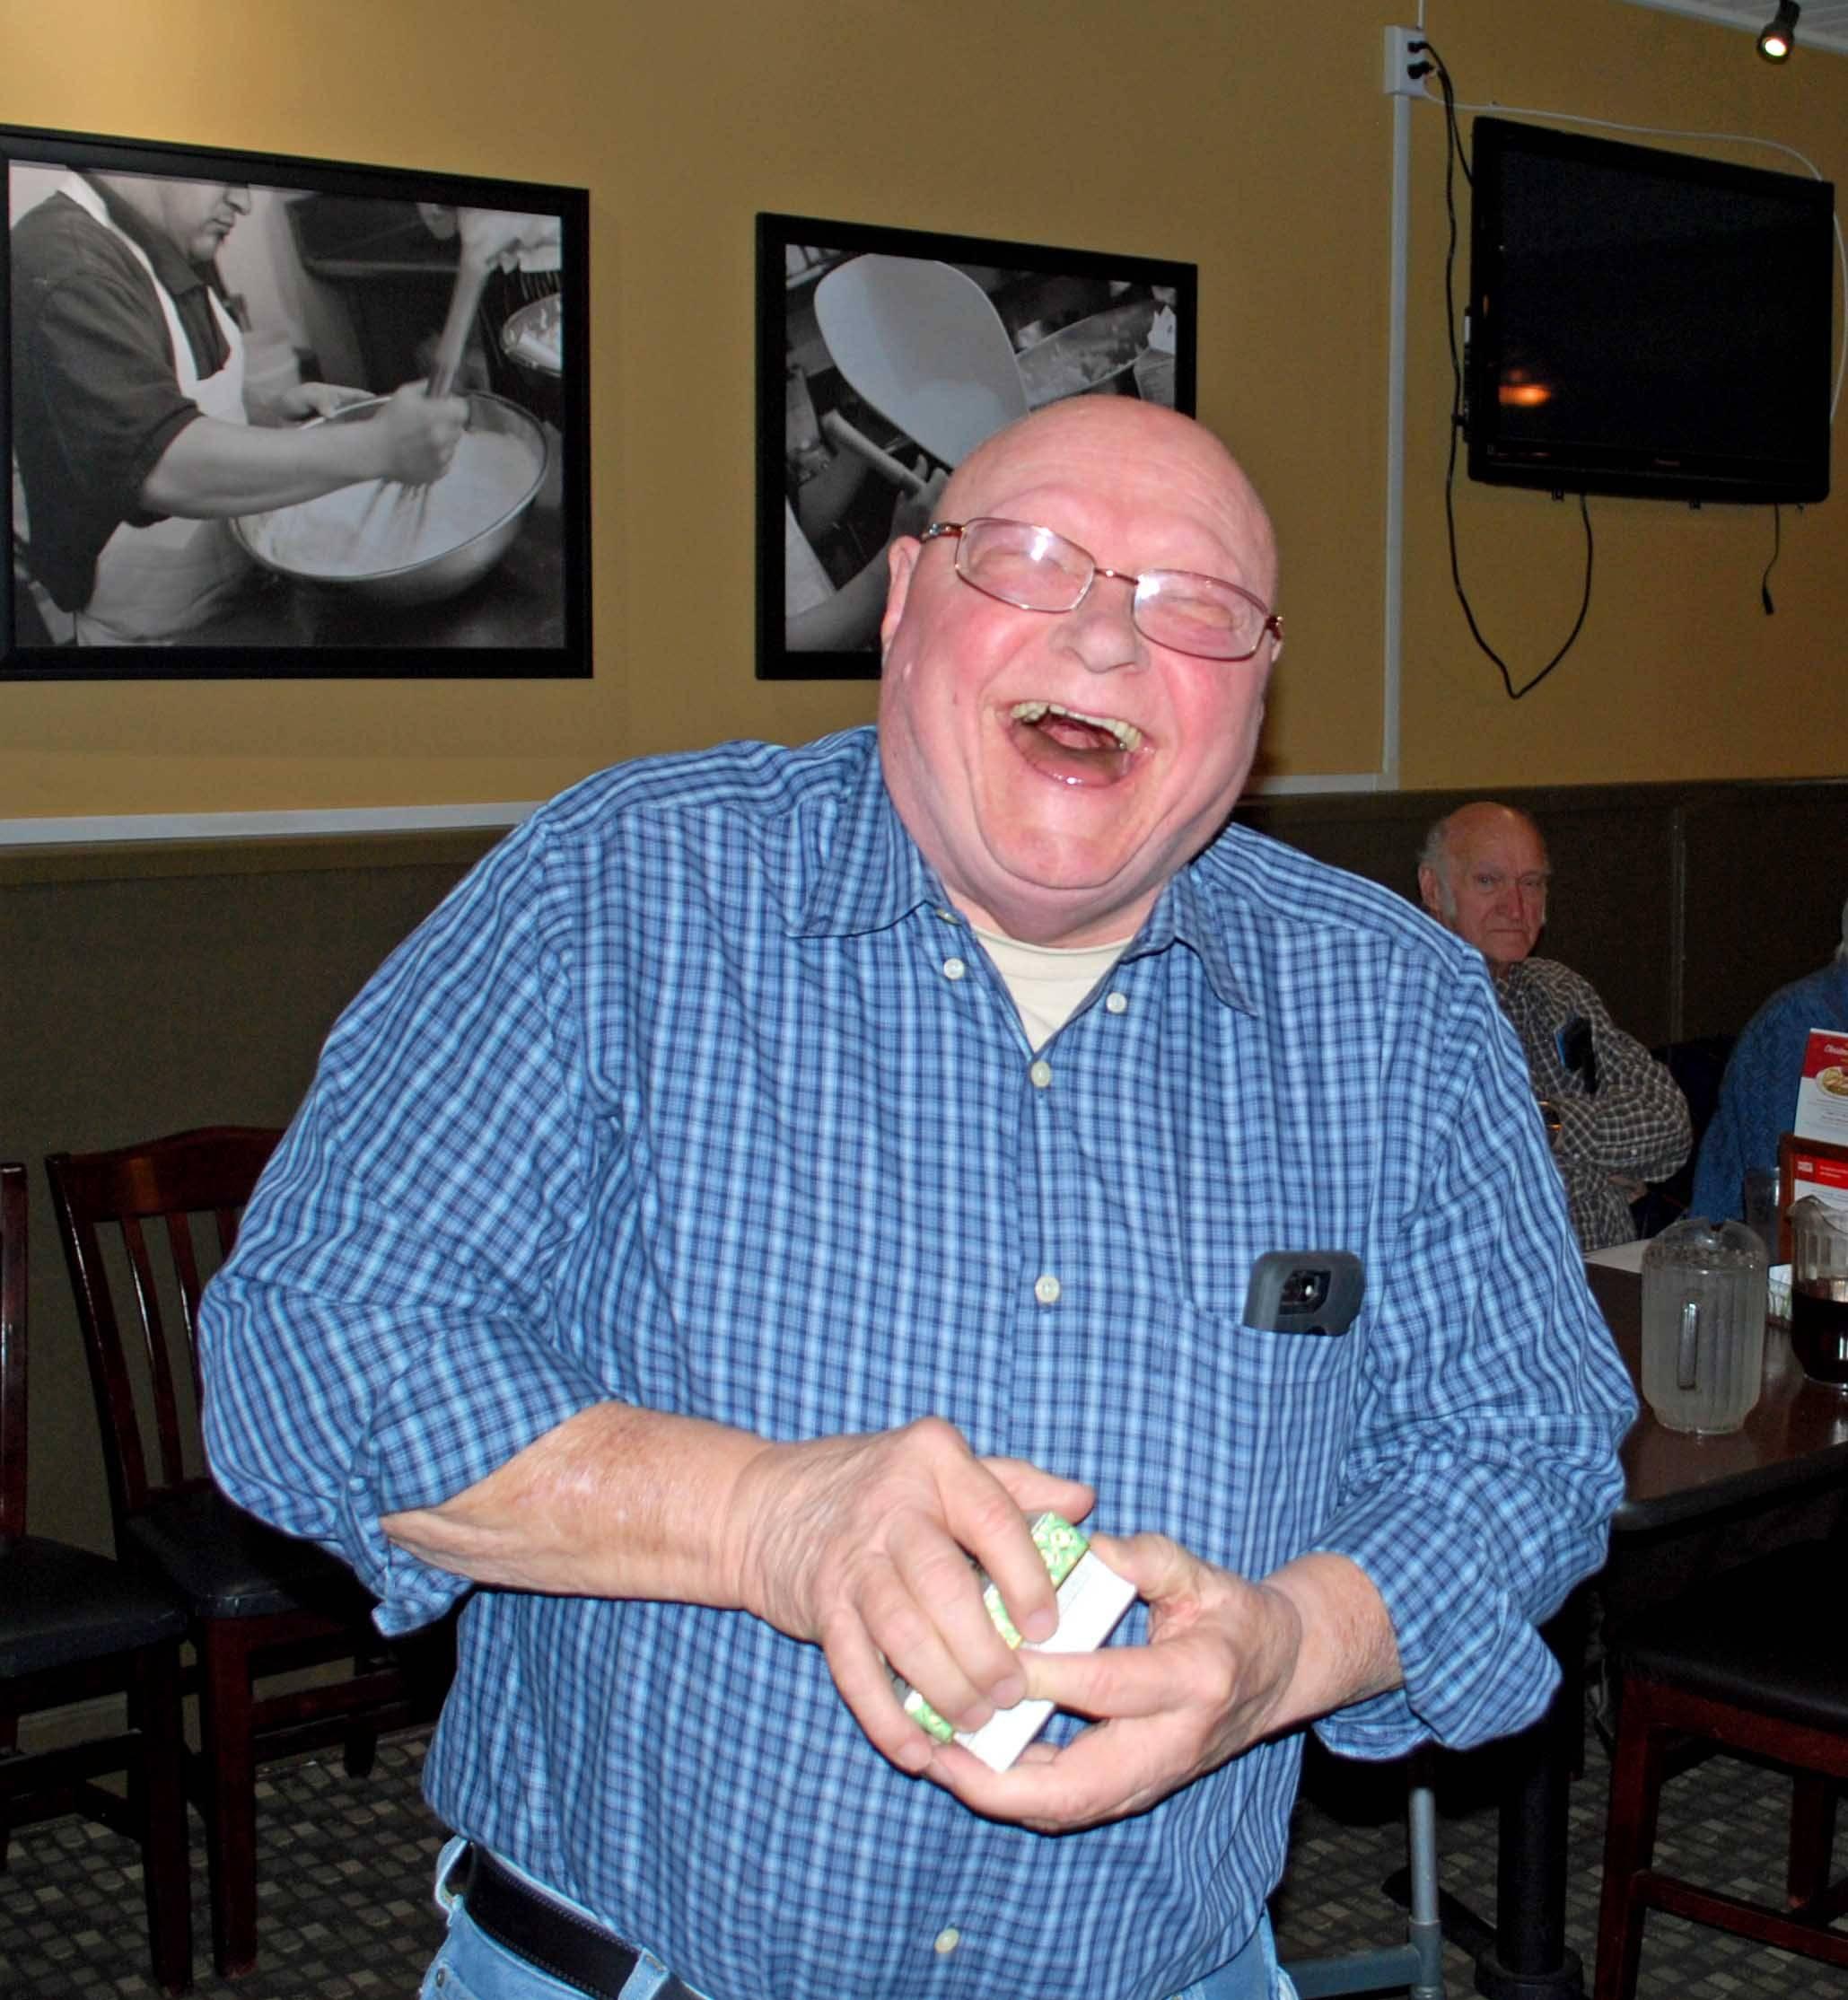 Dennis B really likes his gift!